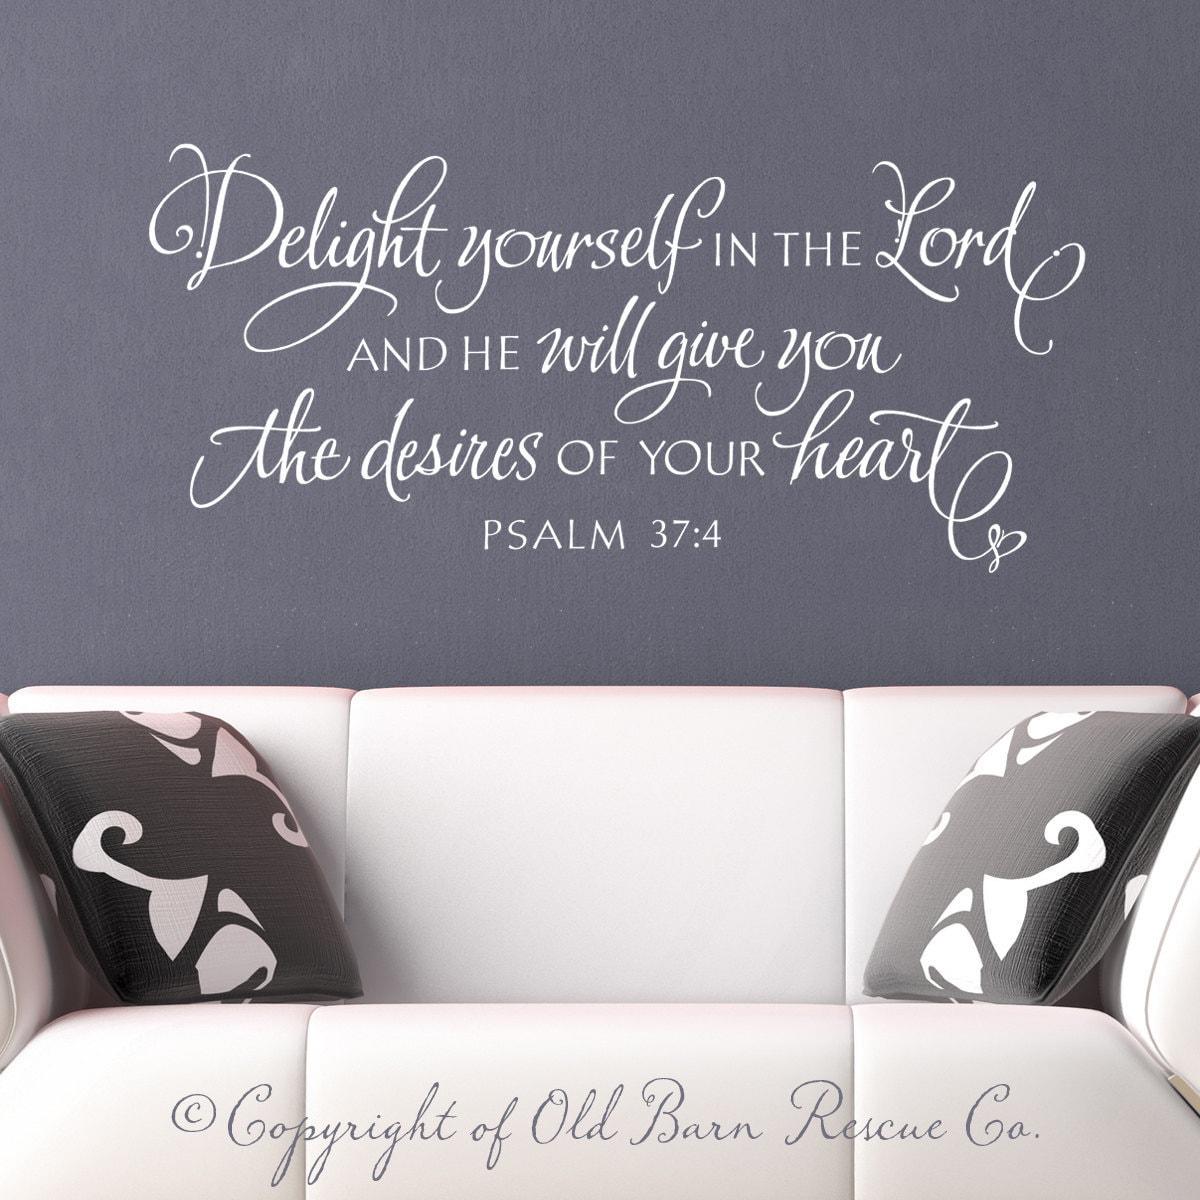 christian wall decal wall sticker delight by oldbarnrescuecompany. Black Bedroom Furniture Sets. Home Design Ideas